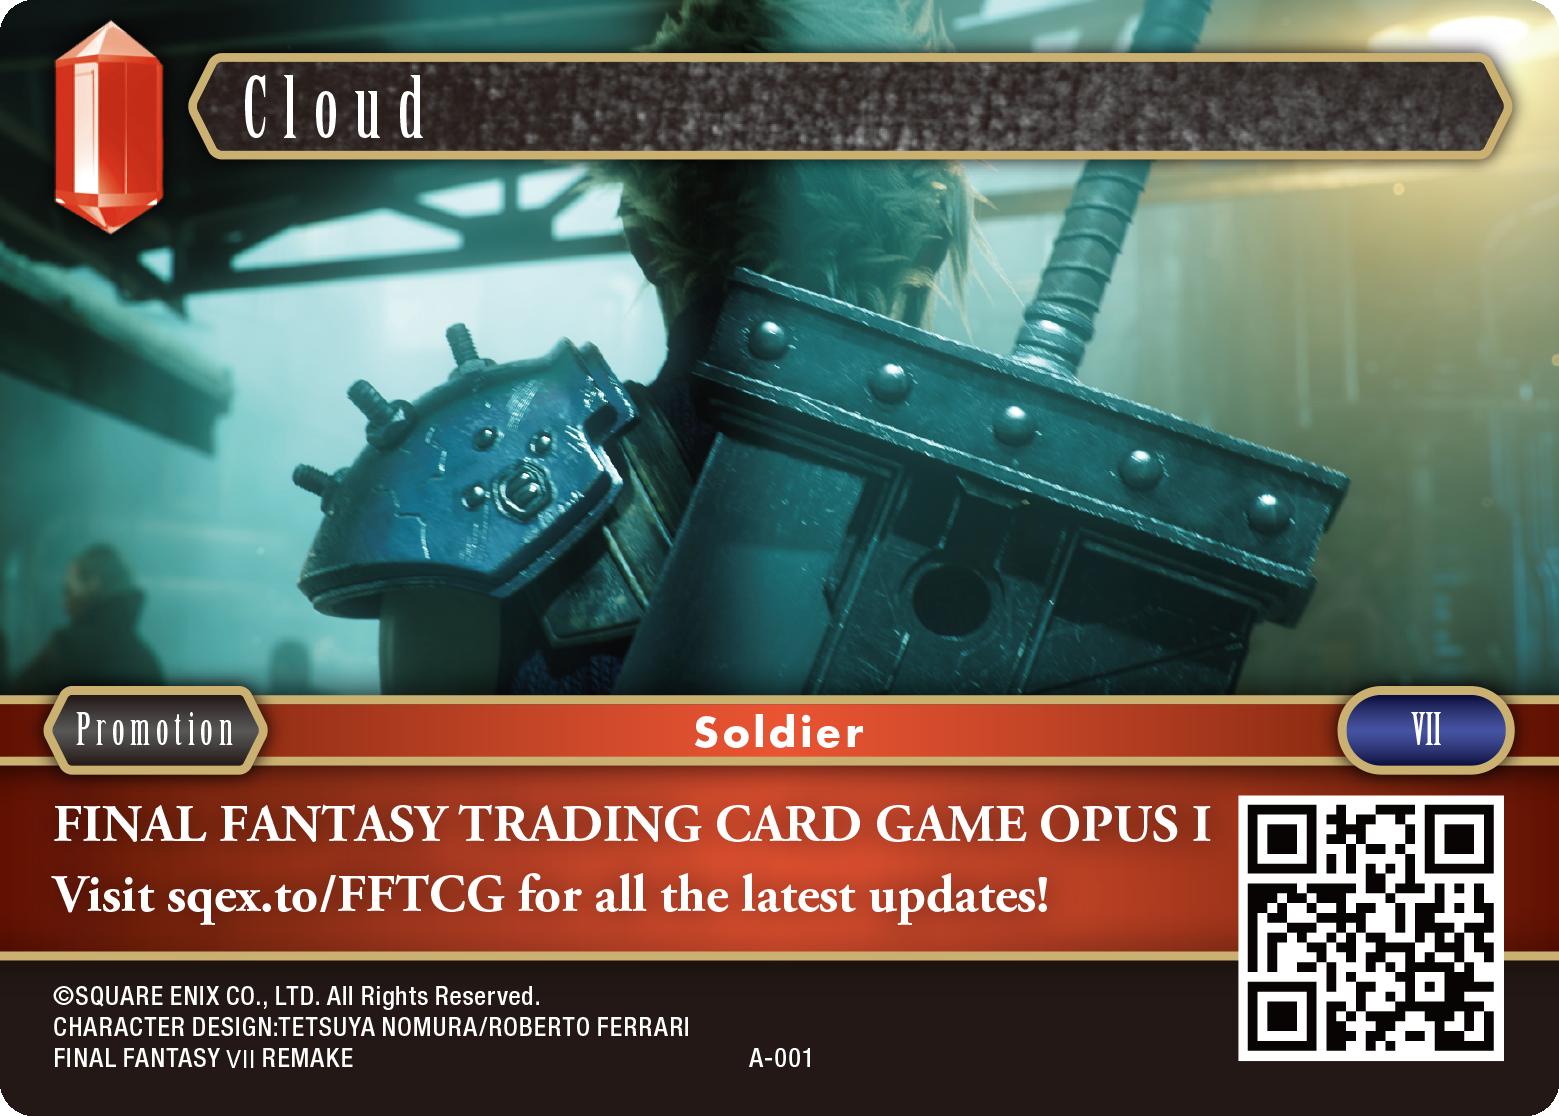 FFTCG Promo Cards